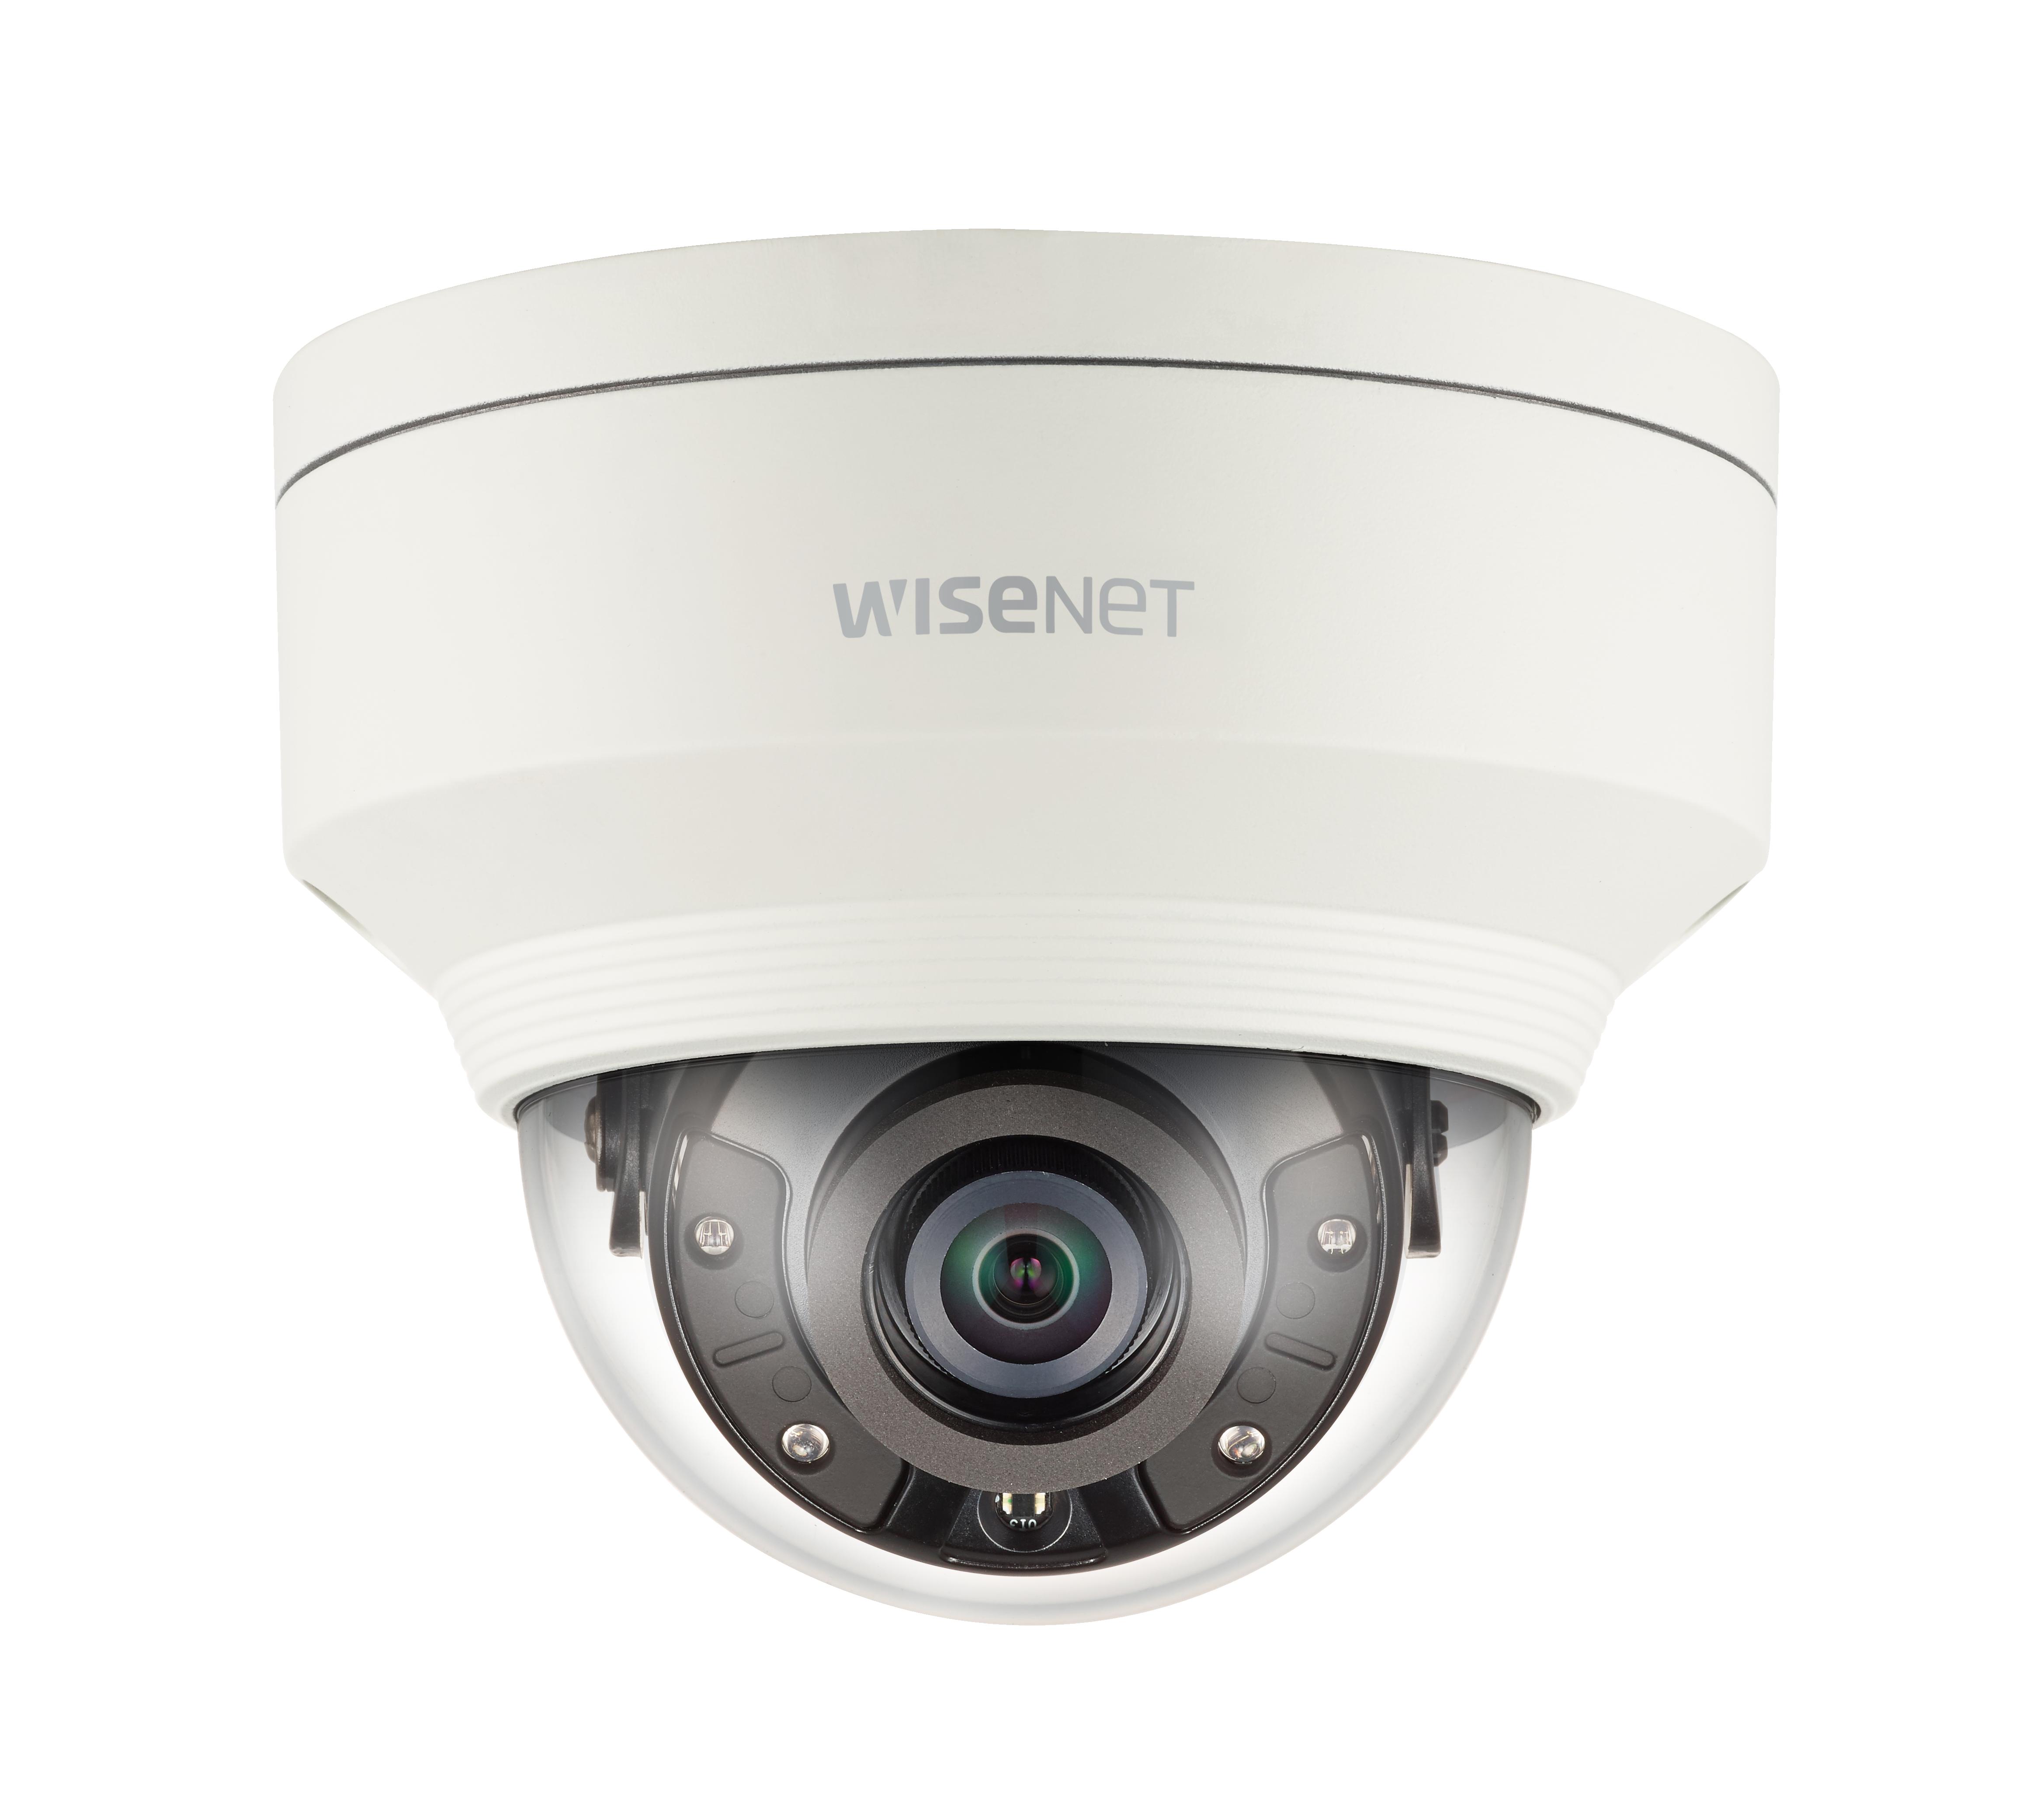 Kamera sieciowa IP 5MP kopułowa wandaloodporna